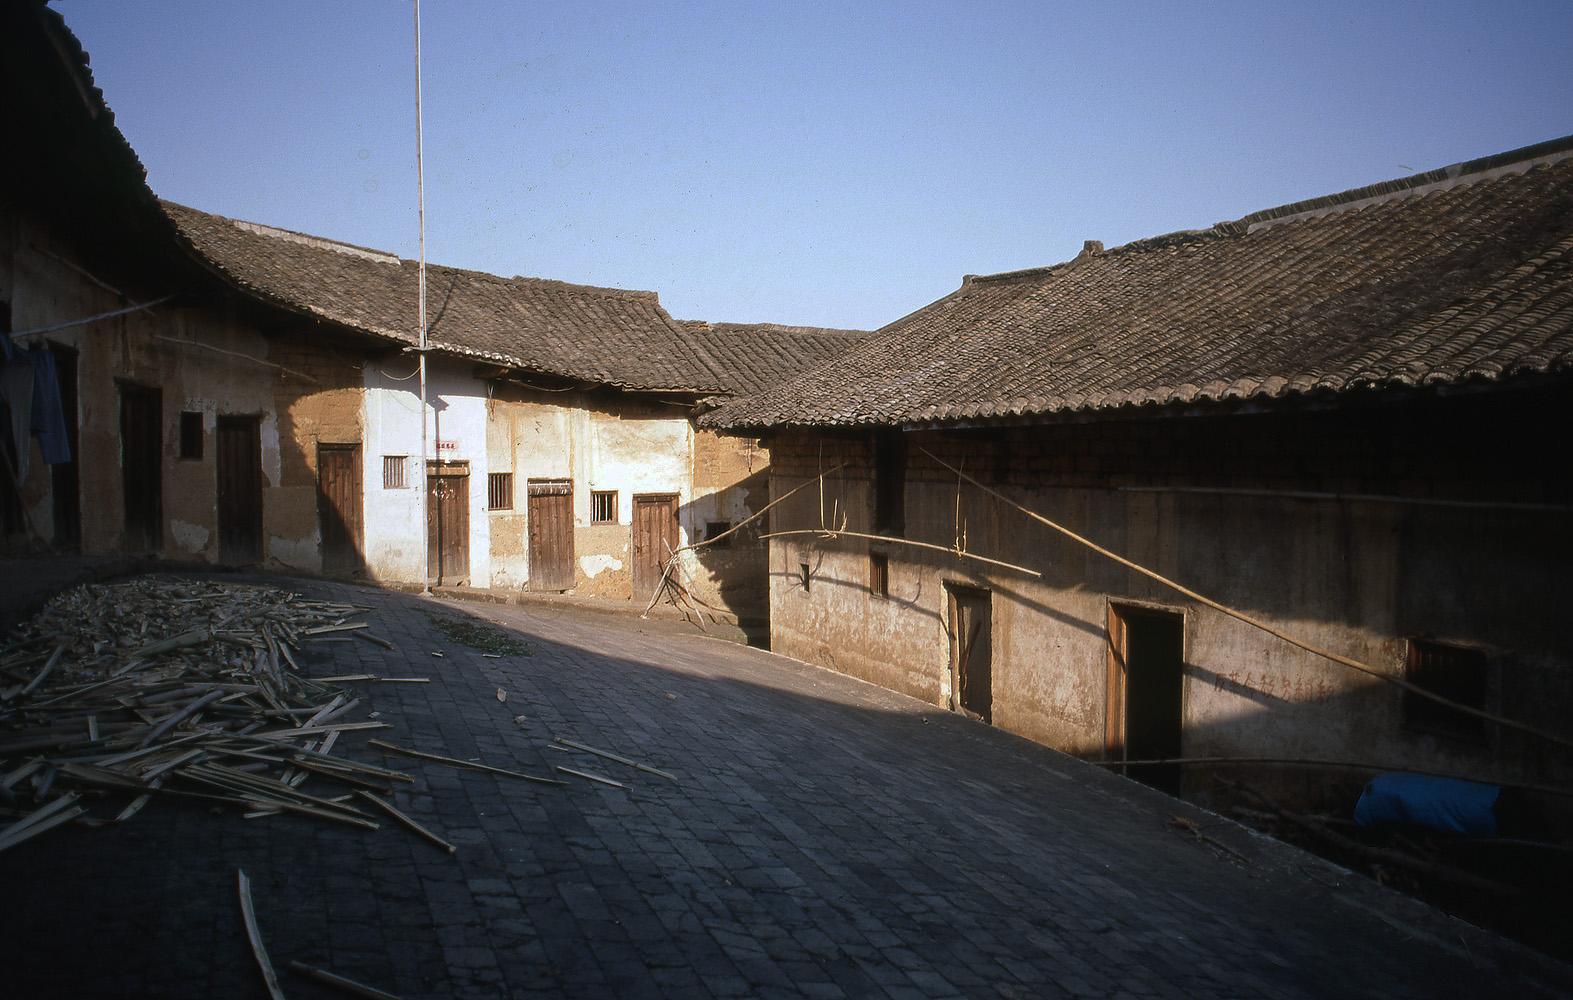 82-meixianbackcourt